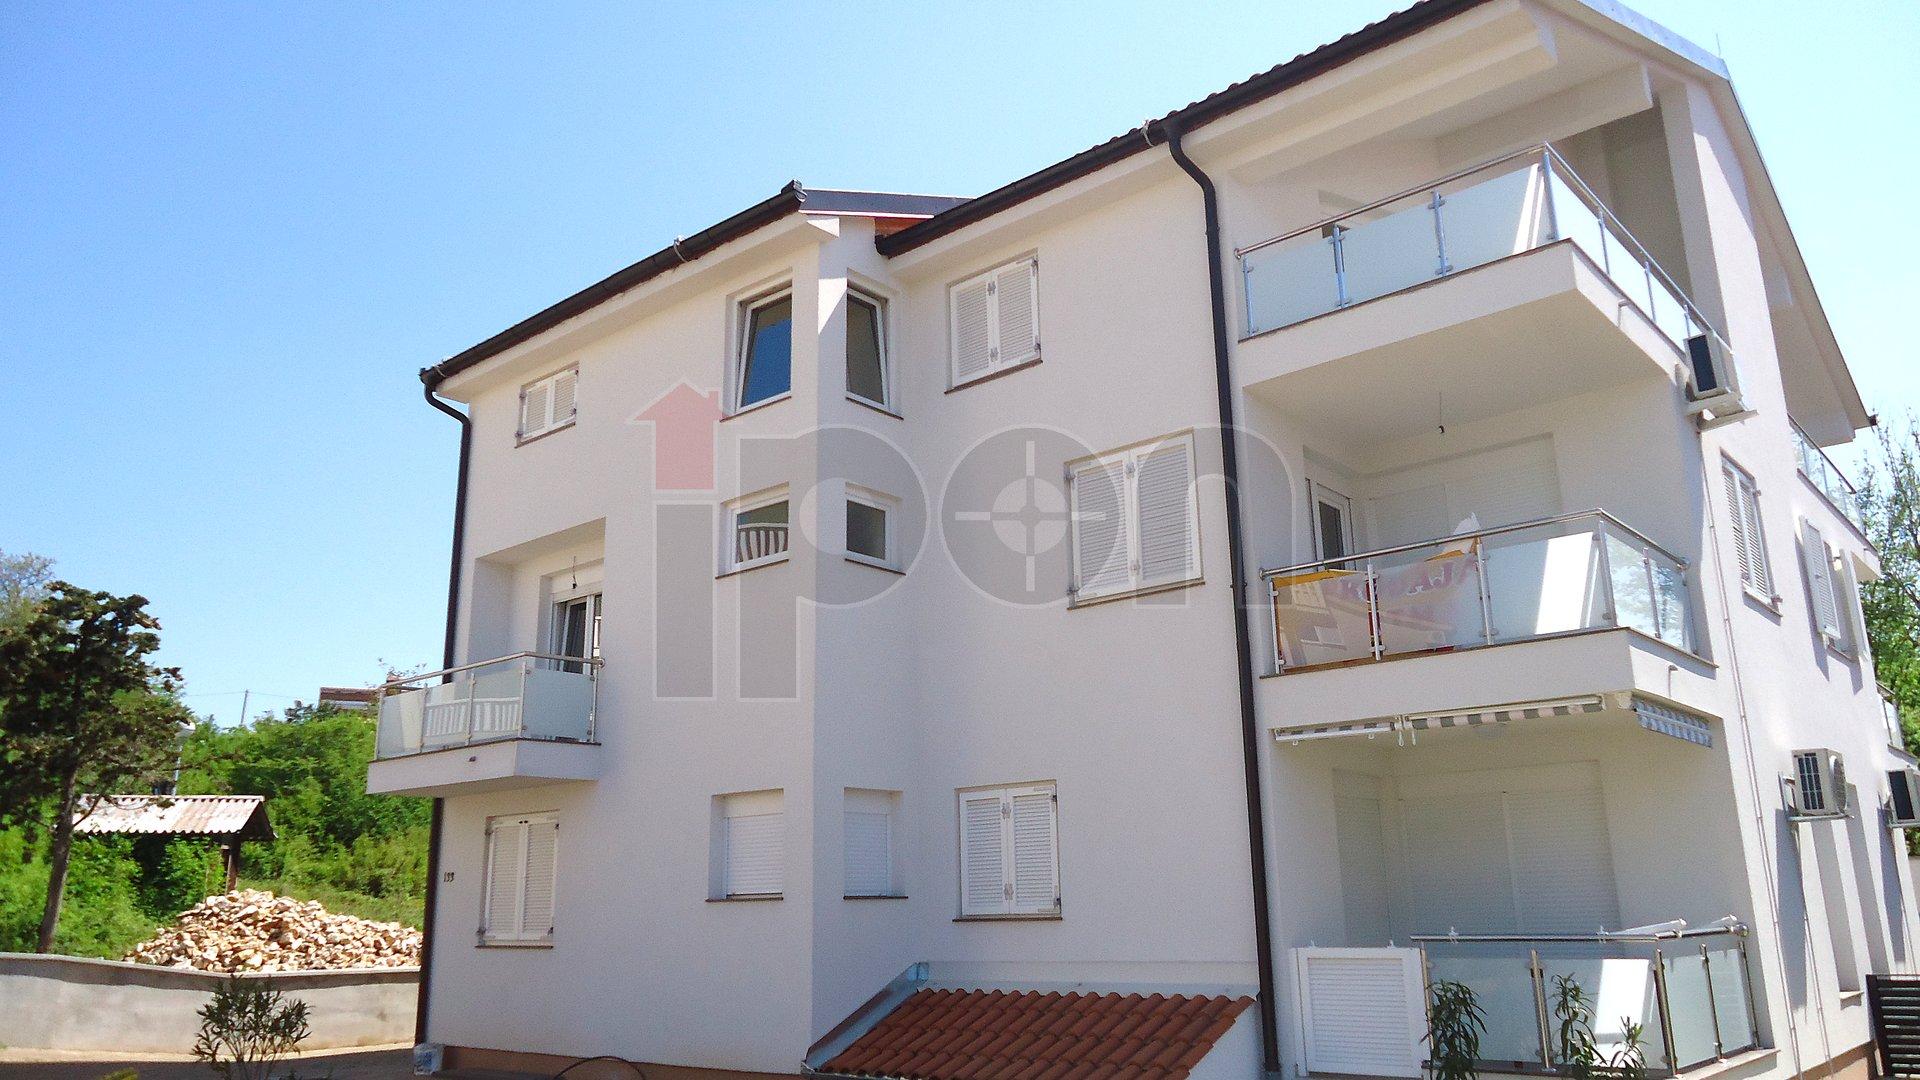 Appartamento, 145 m2, Vendita, Malinska